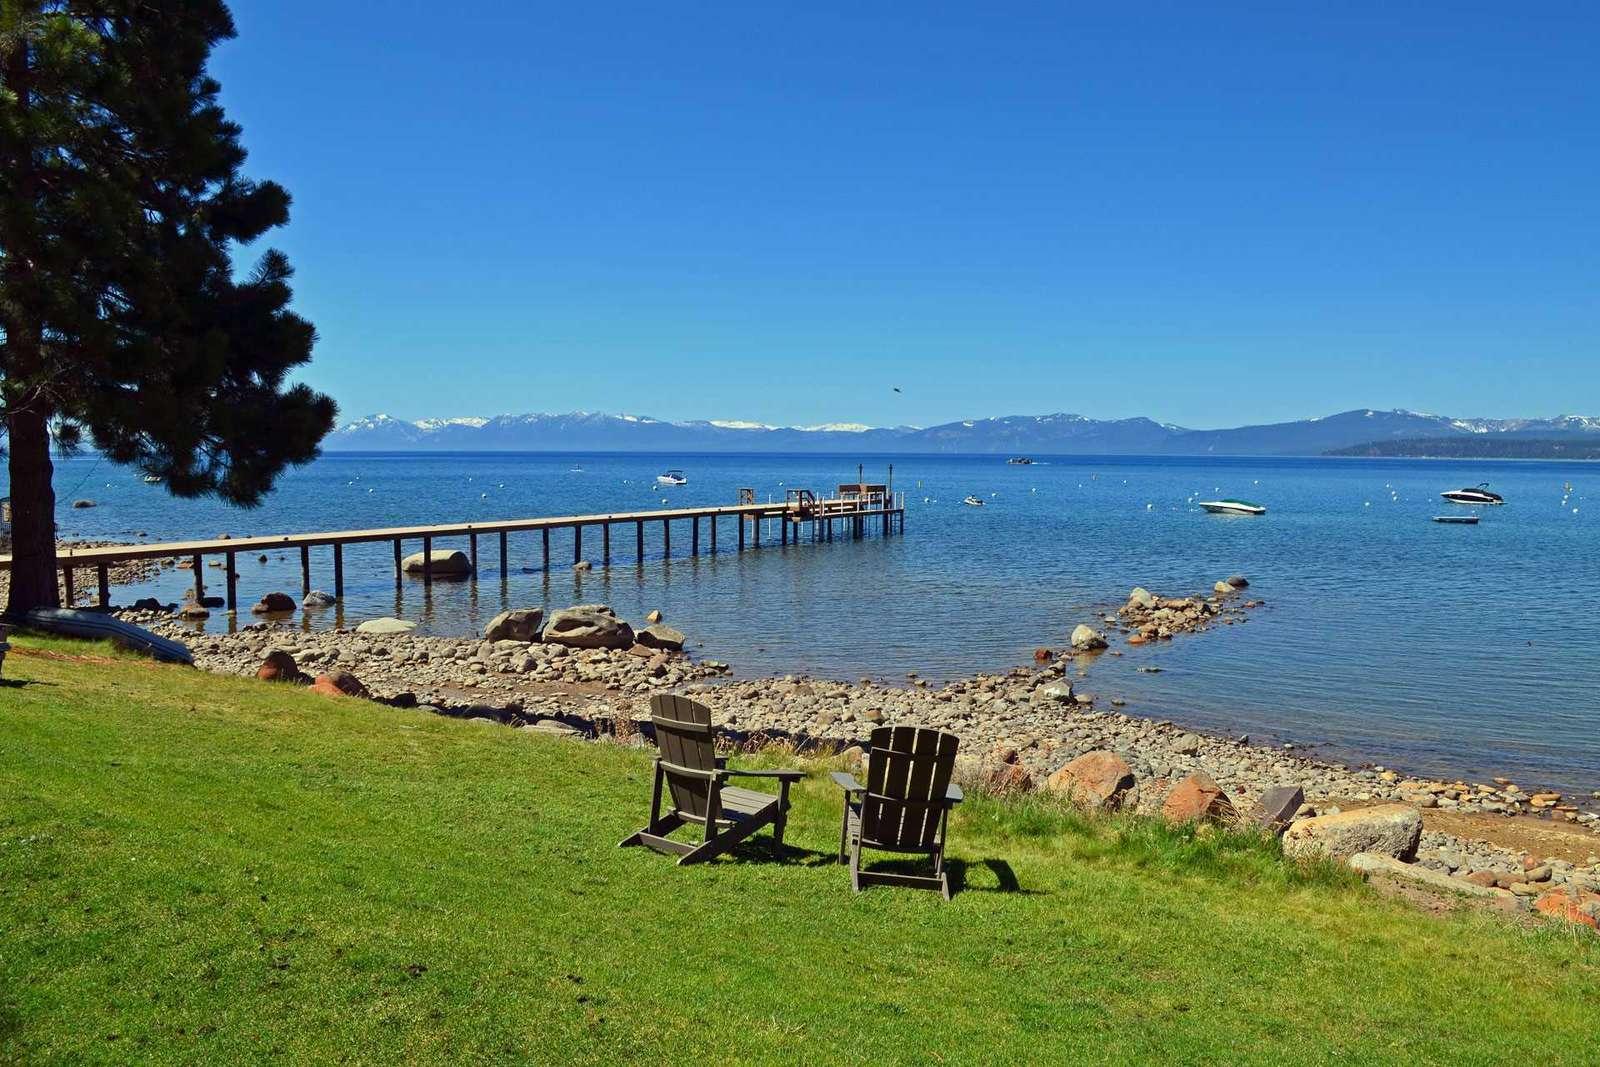 Lawn area next to Lake Tahoe